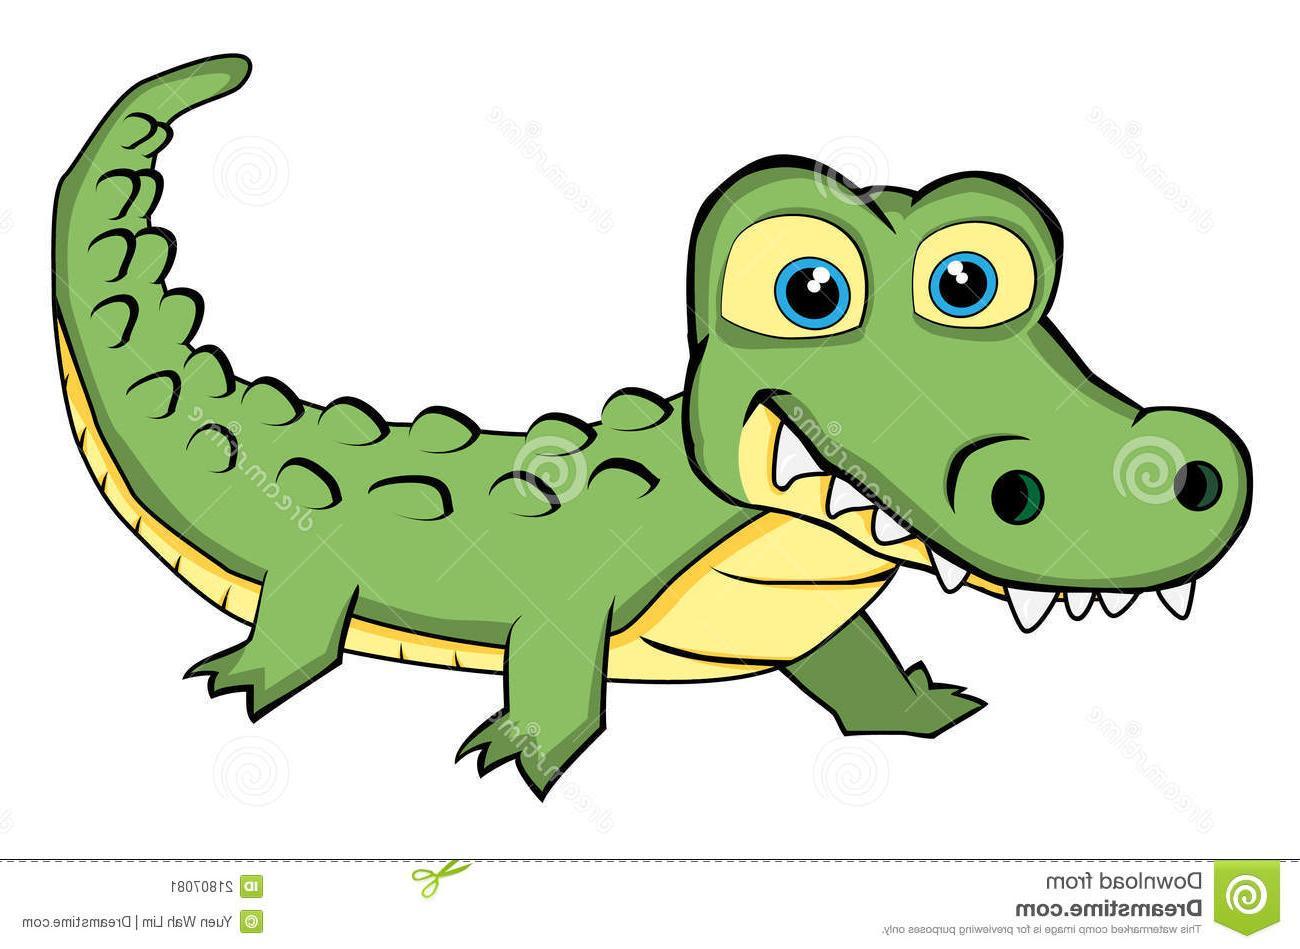 Crocodile Clipart Images 9-crocodile clipart images 9-10